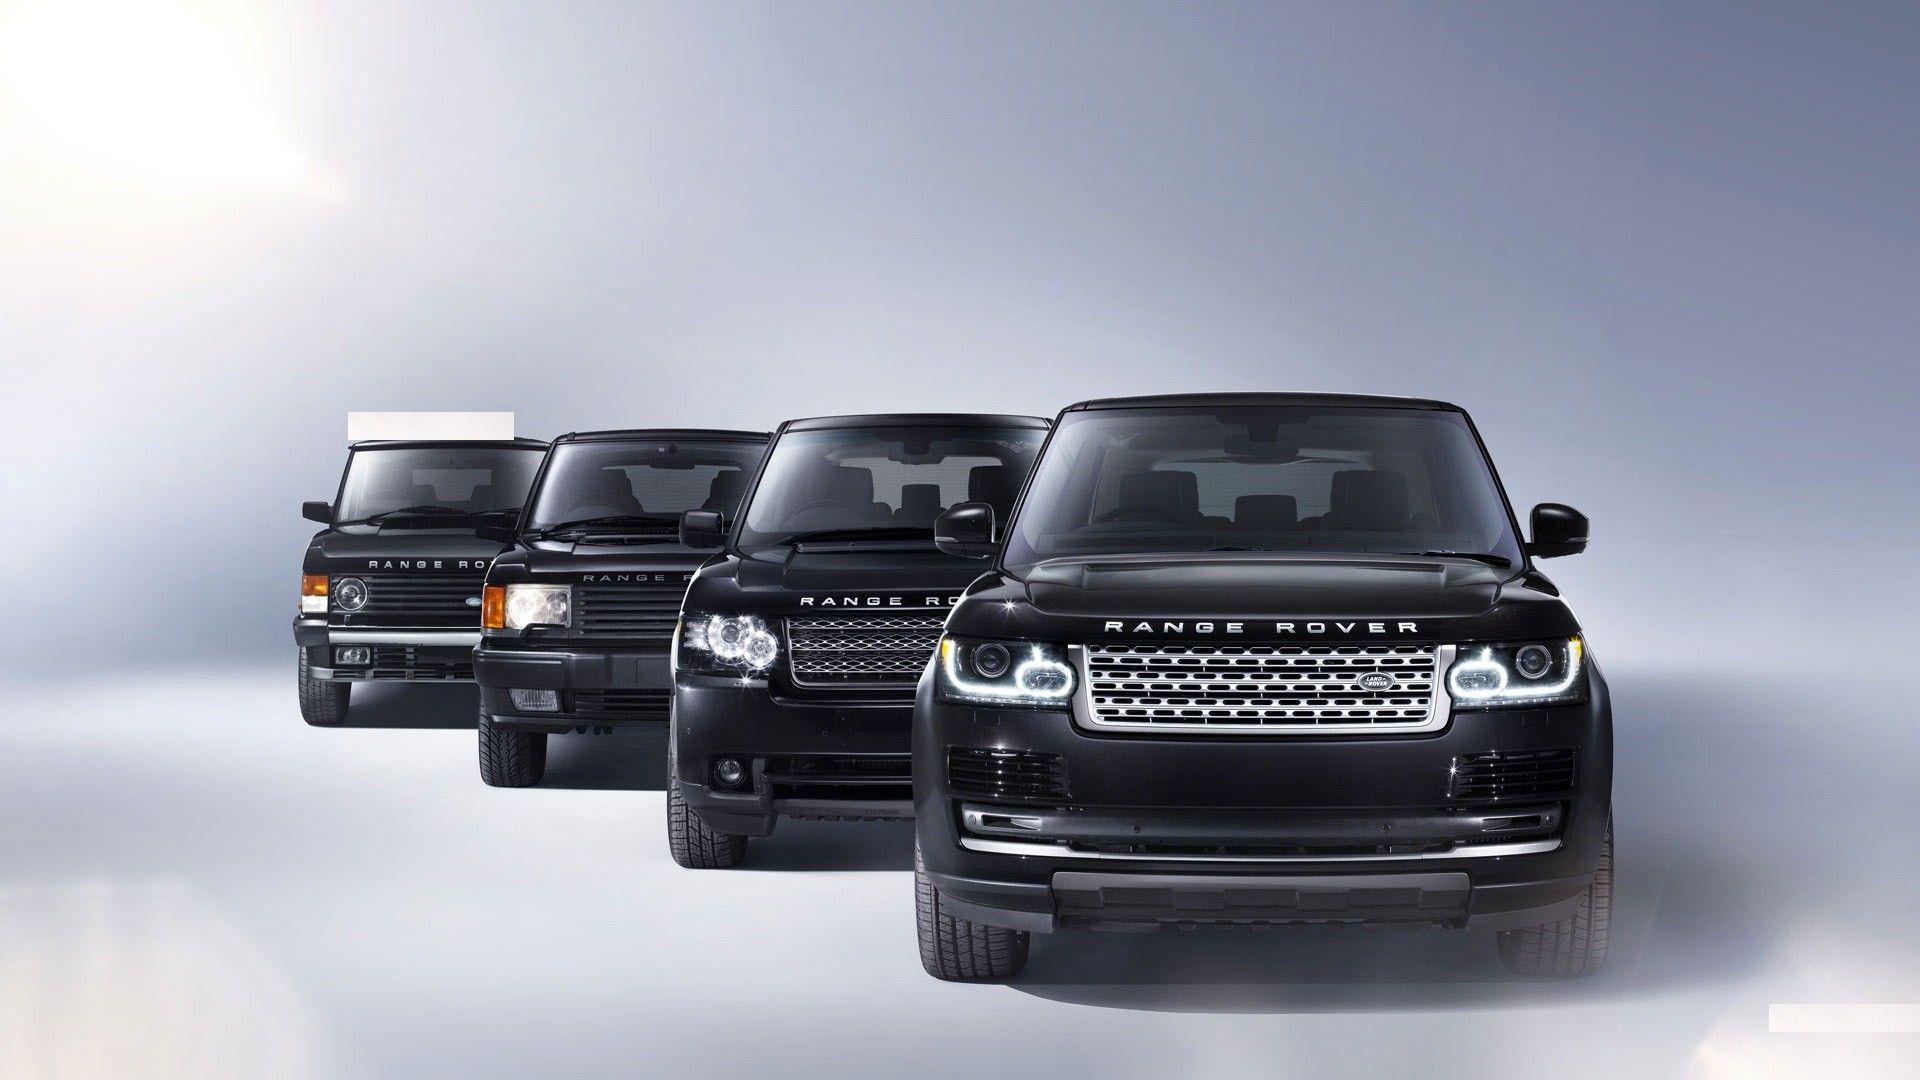 Black Range Rover All Models Auto Pinterest